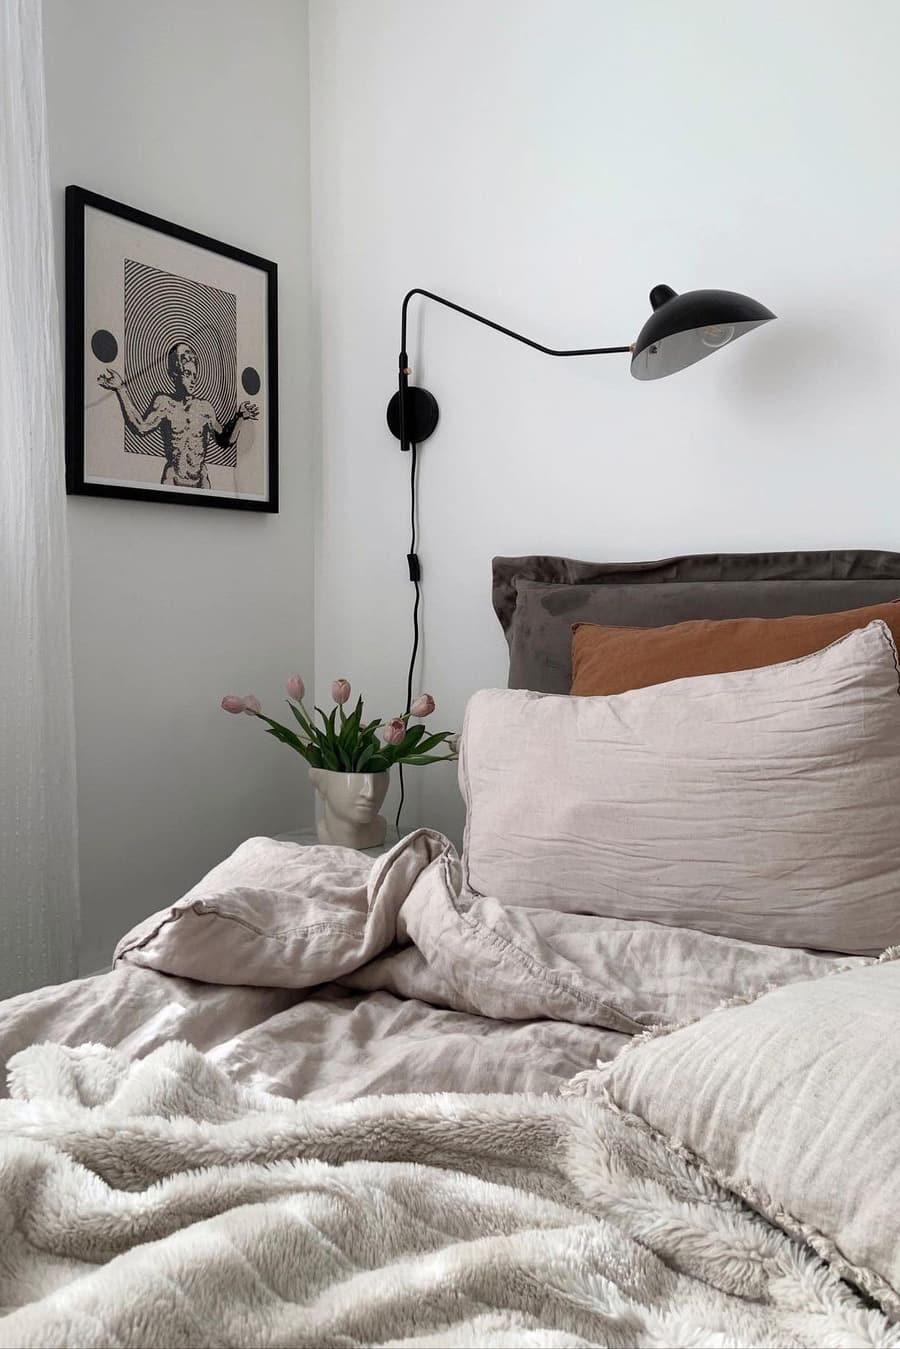 Wall bedside lamp